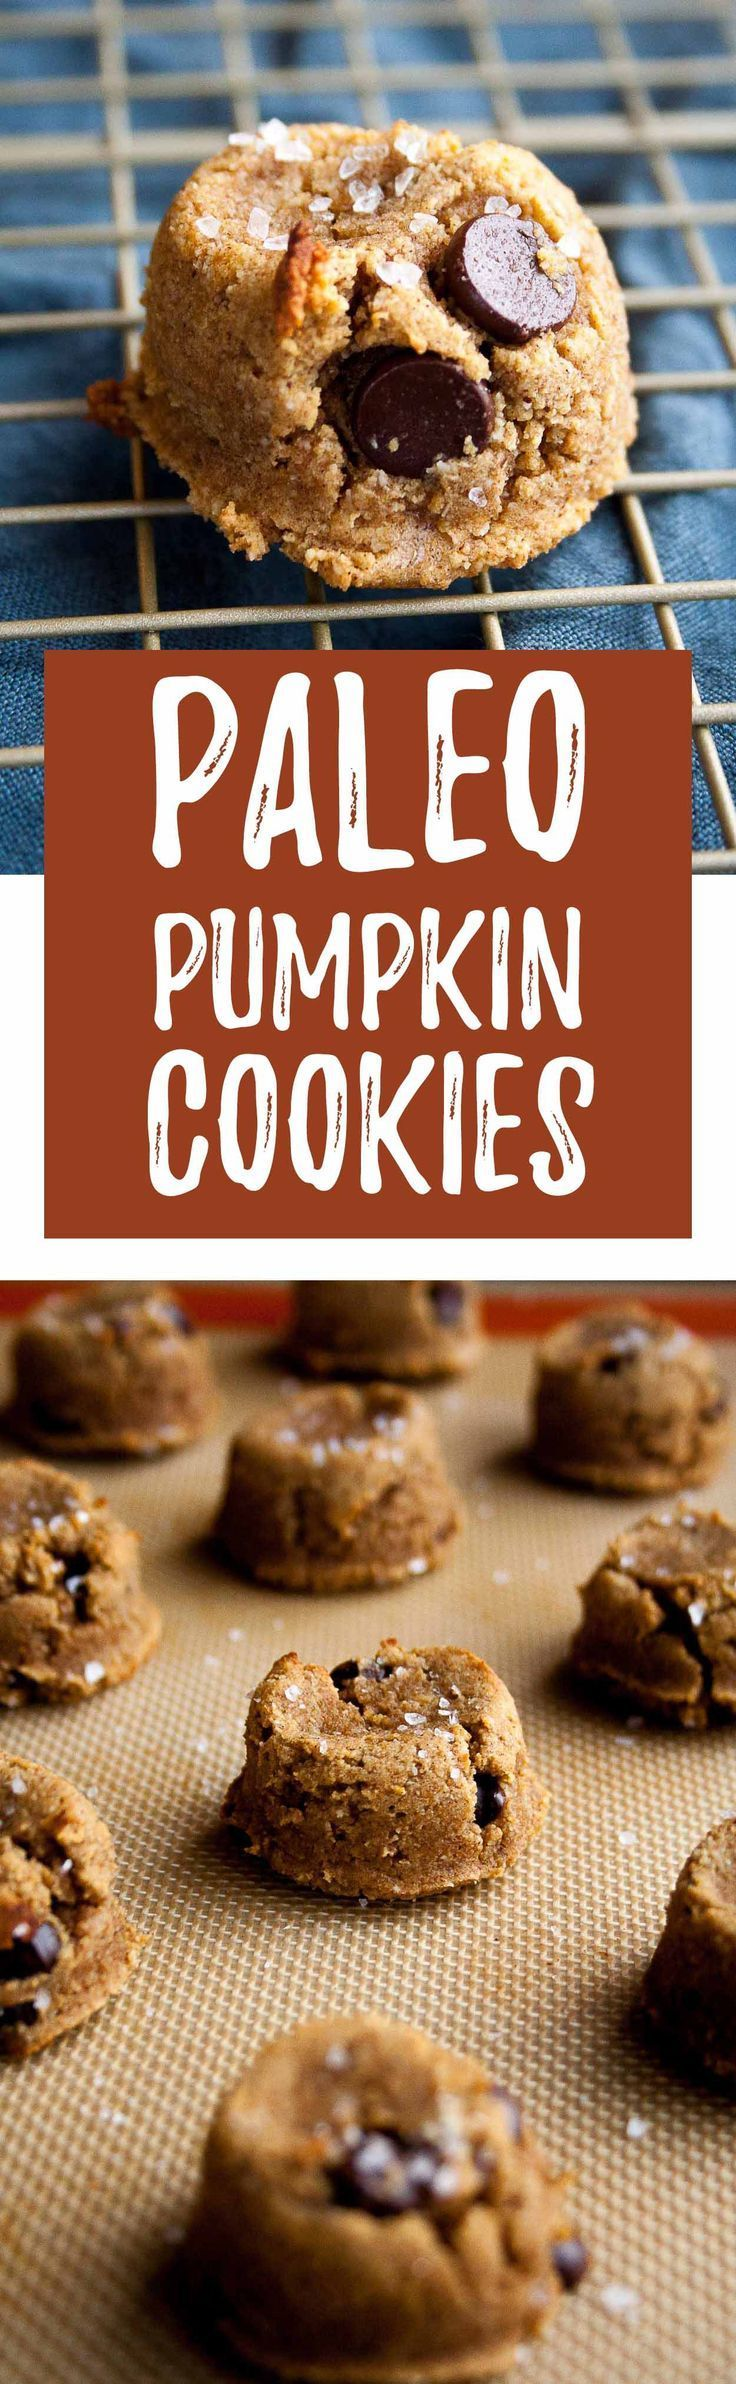 Paleo Pumpkin Cookies with Dark Chocolate Chips | pumpkin recipes, coconut flour, almond flour, maple syrup, gluten free, diary free, grain free, easy, pumpkin spice, fall, baking | hungrybynature.com